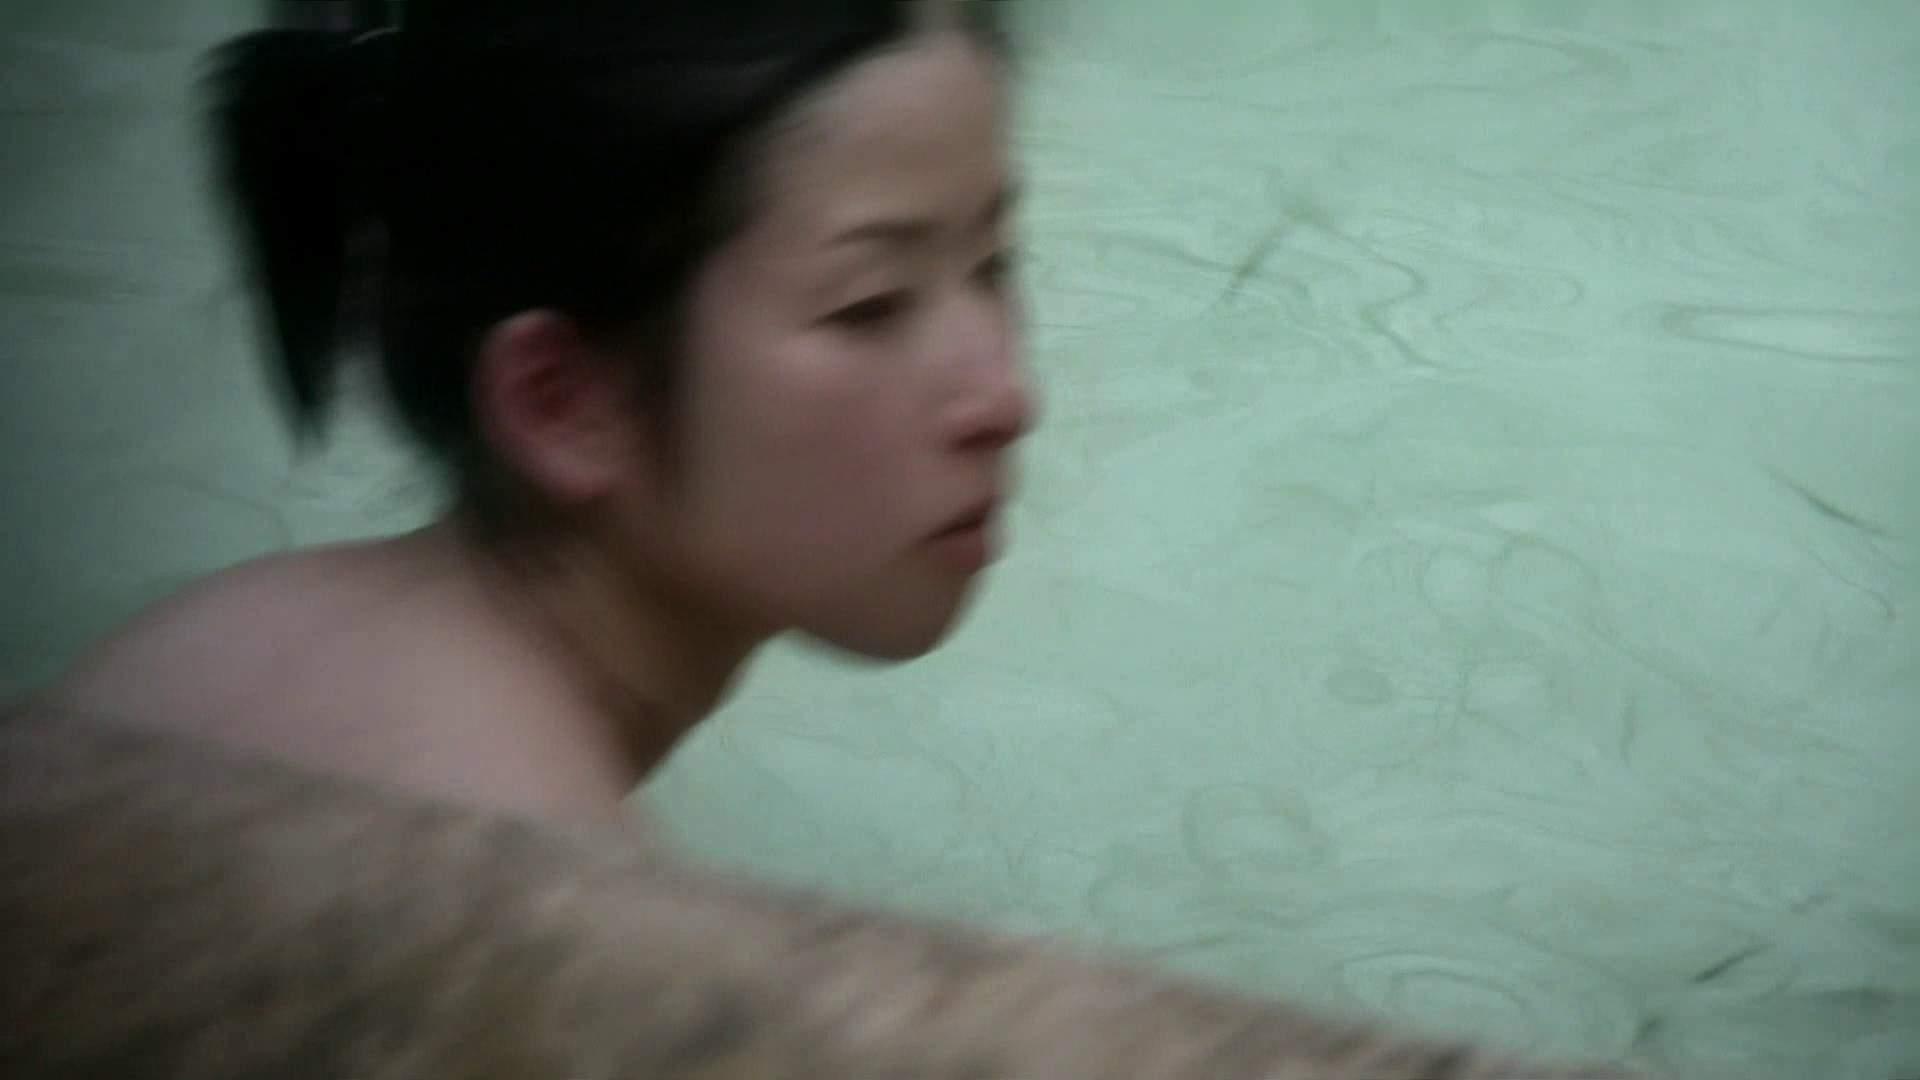 Aquaな露天風呂Vol.656 露天   HなOL  71pic 27